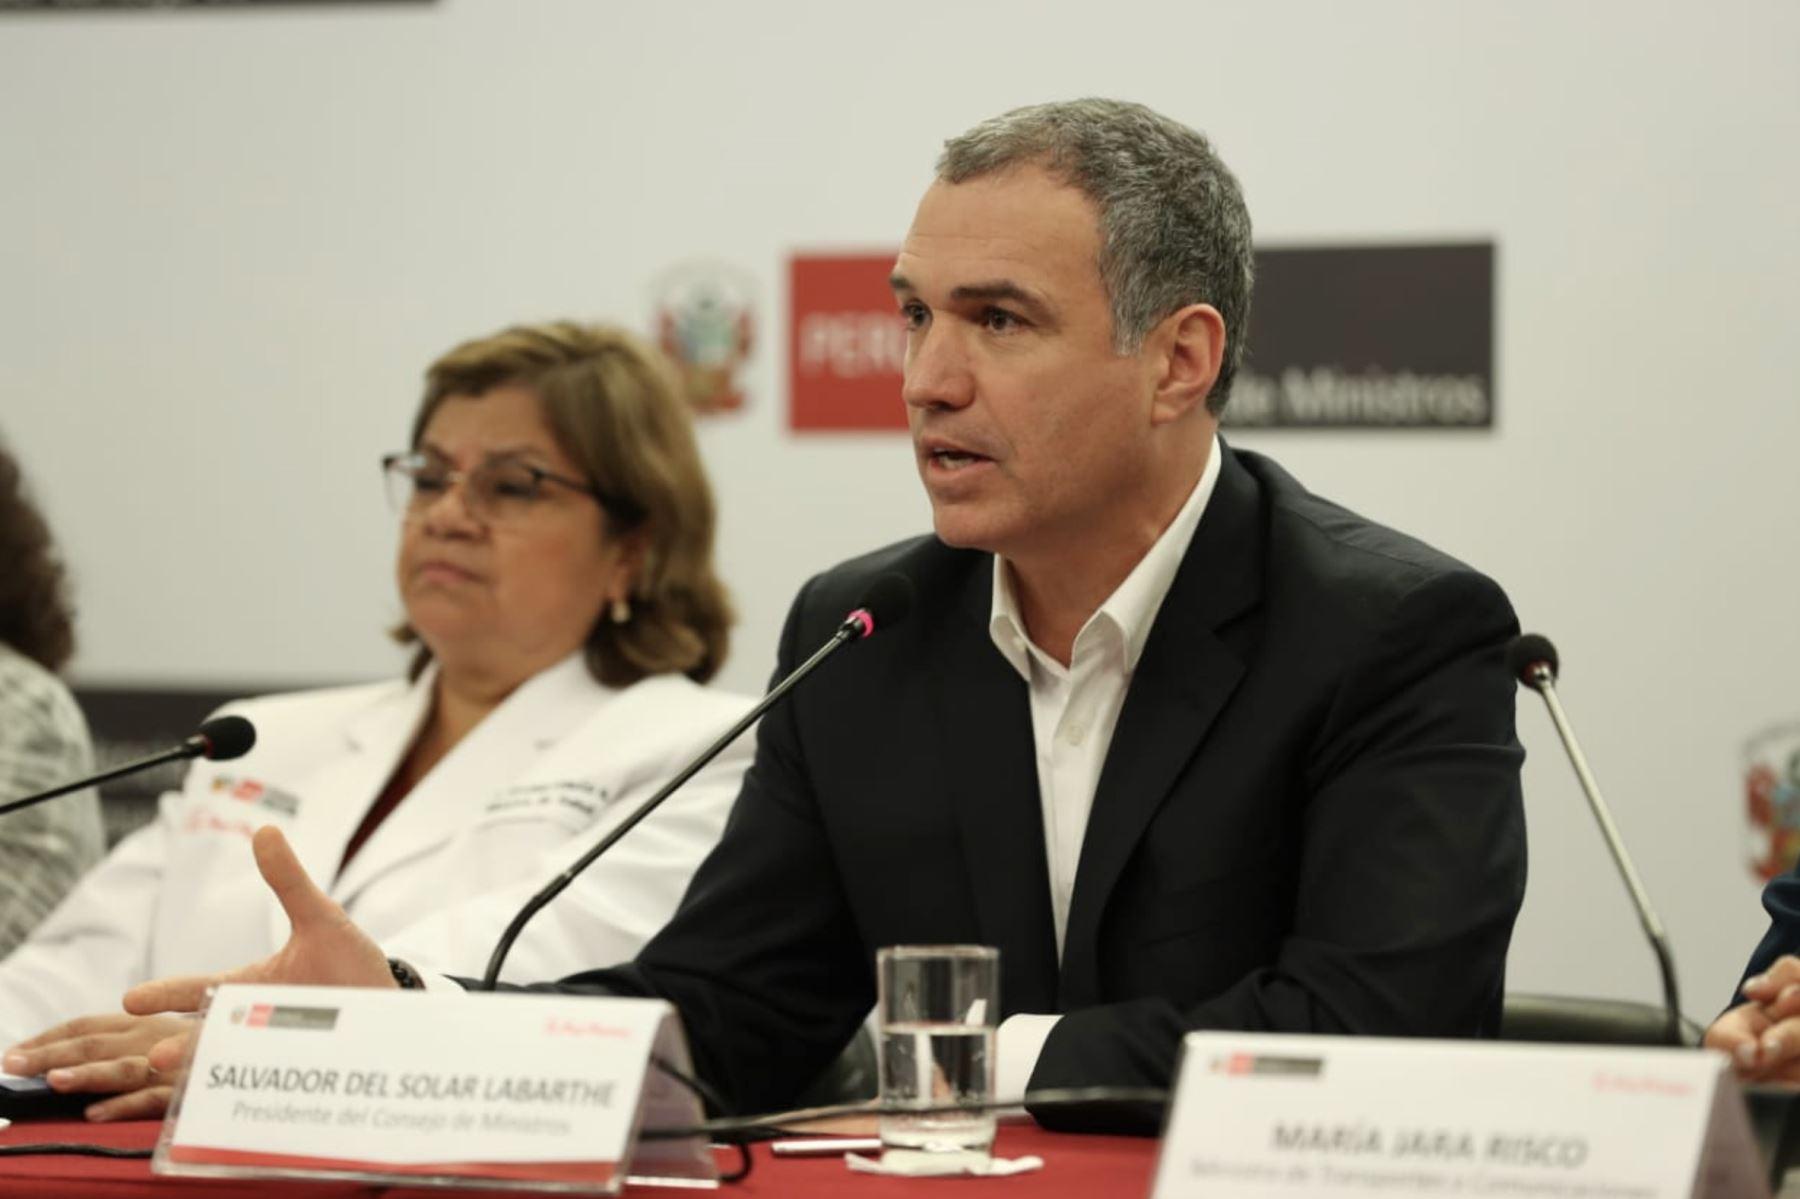 Conferencia de prensa del primer Ministro Del Solar junto a ministros de sectores del MINSA, MTC y MINAGRI. Foto: ANDINA/PCM